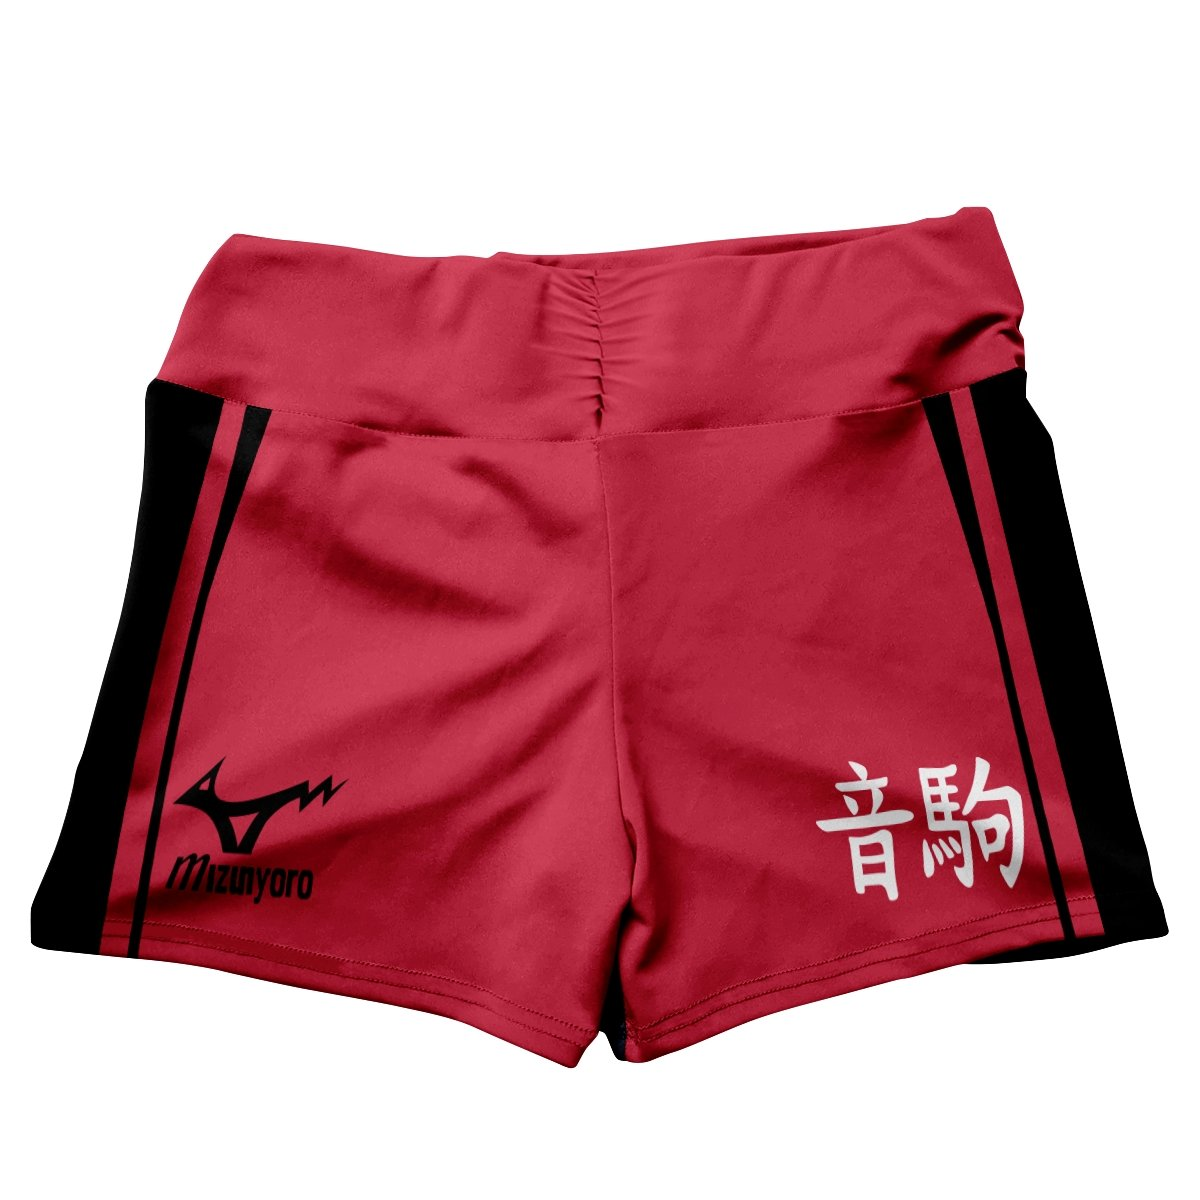 team nekoma active wear set 272821 - Anime Swimsuits